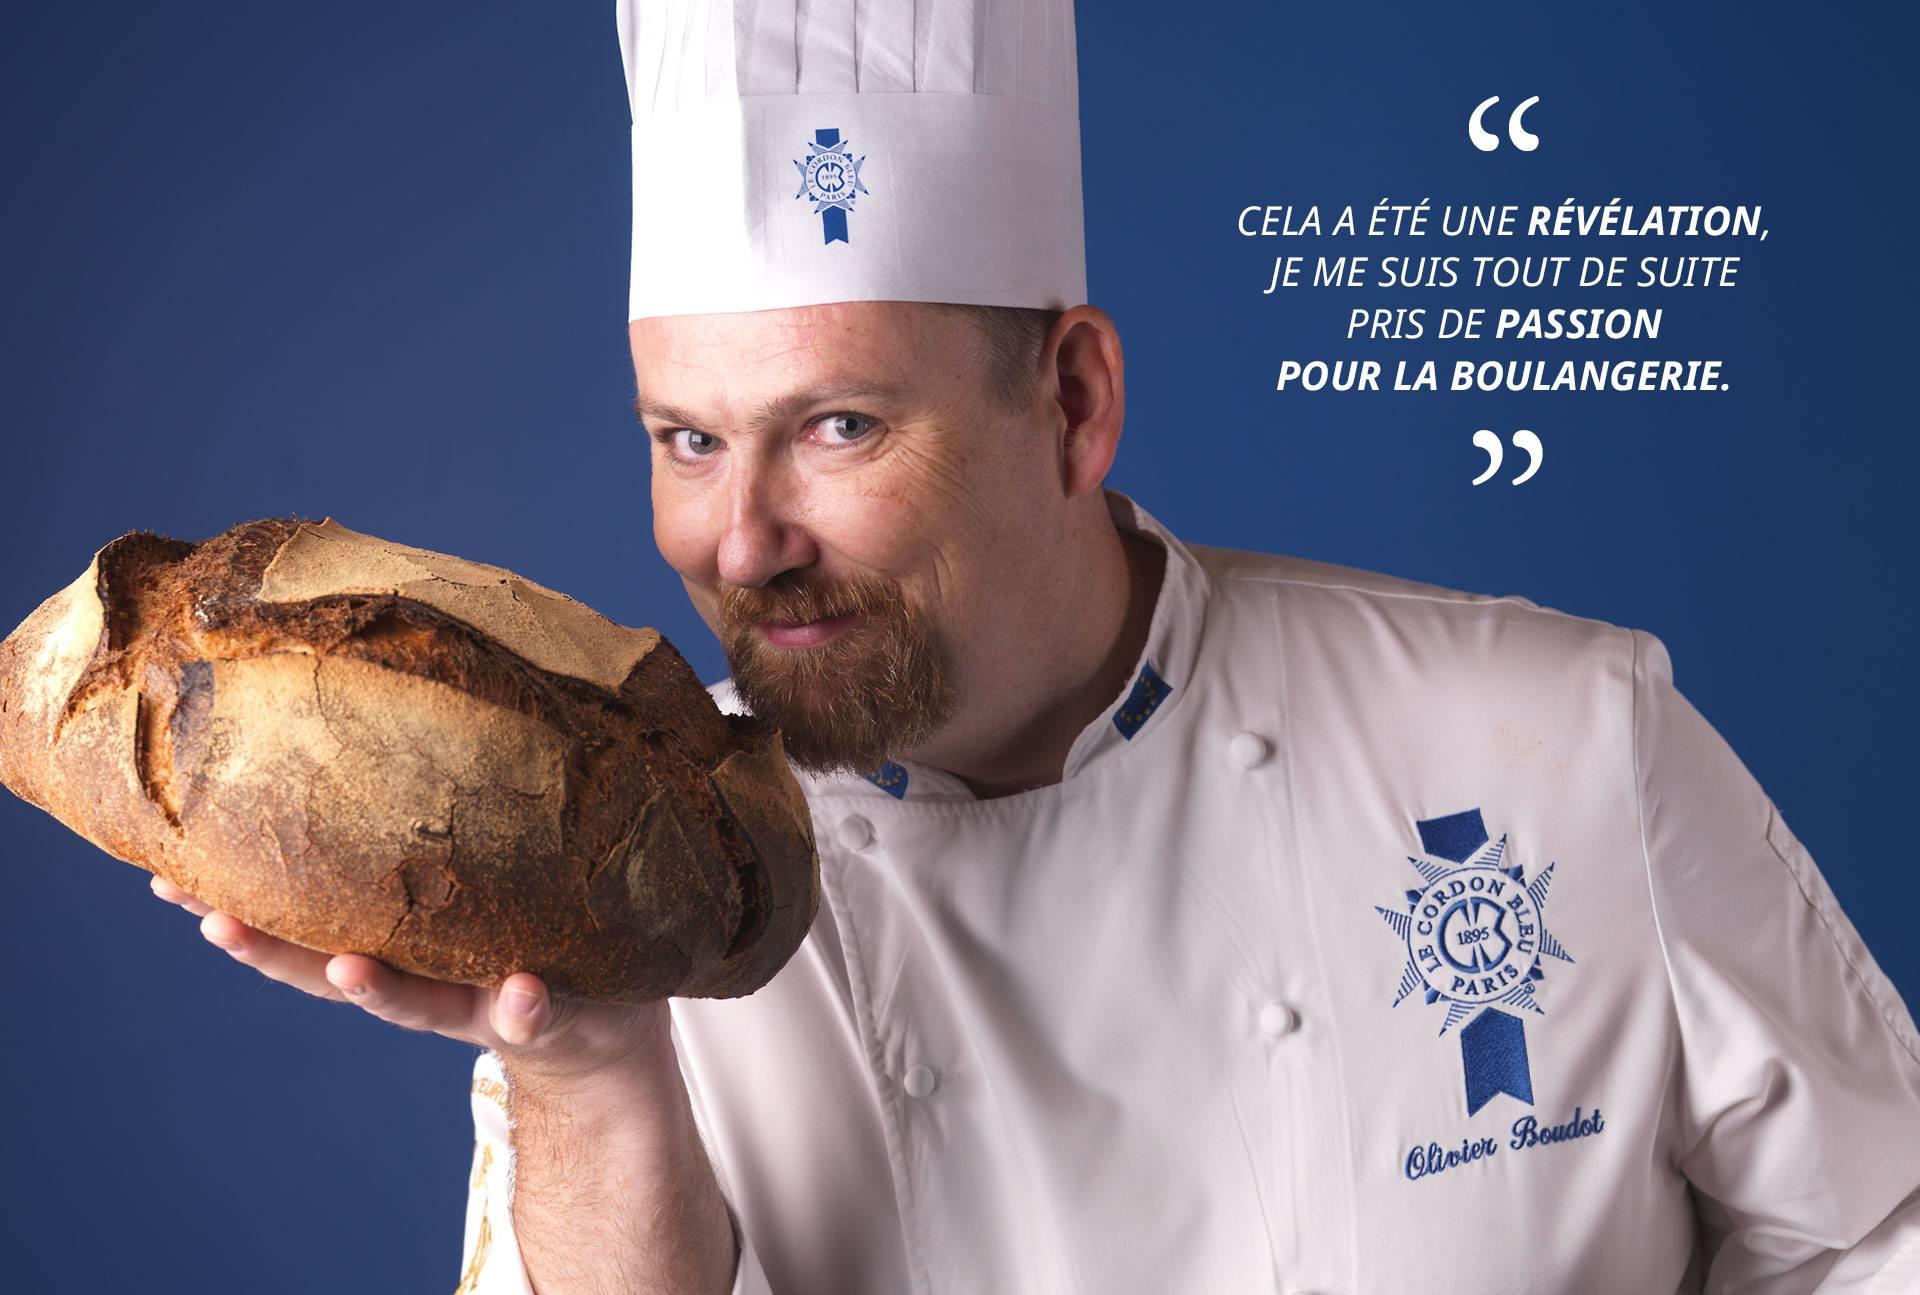 Chef Boudot boulanger